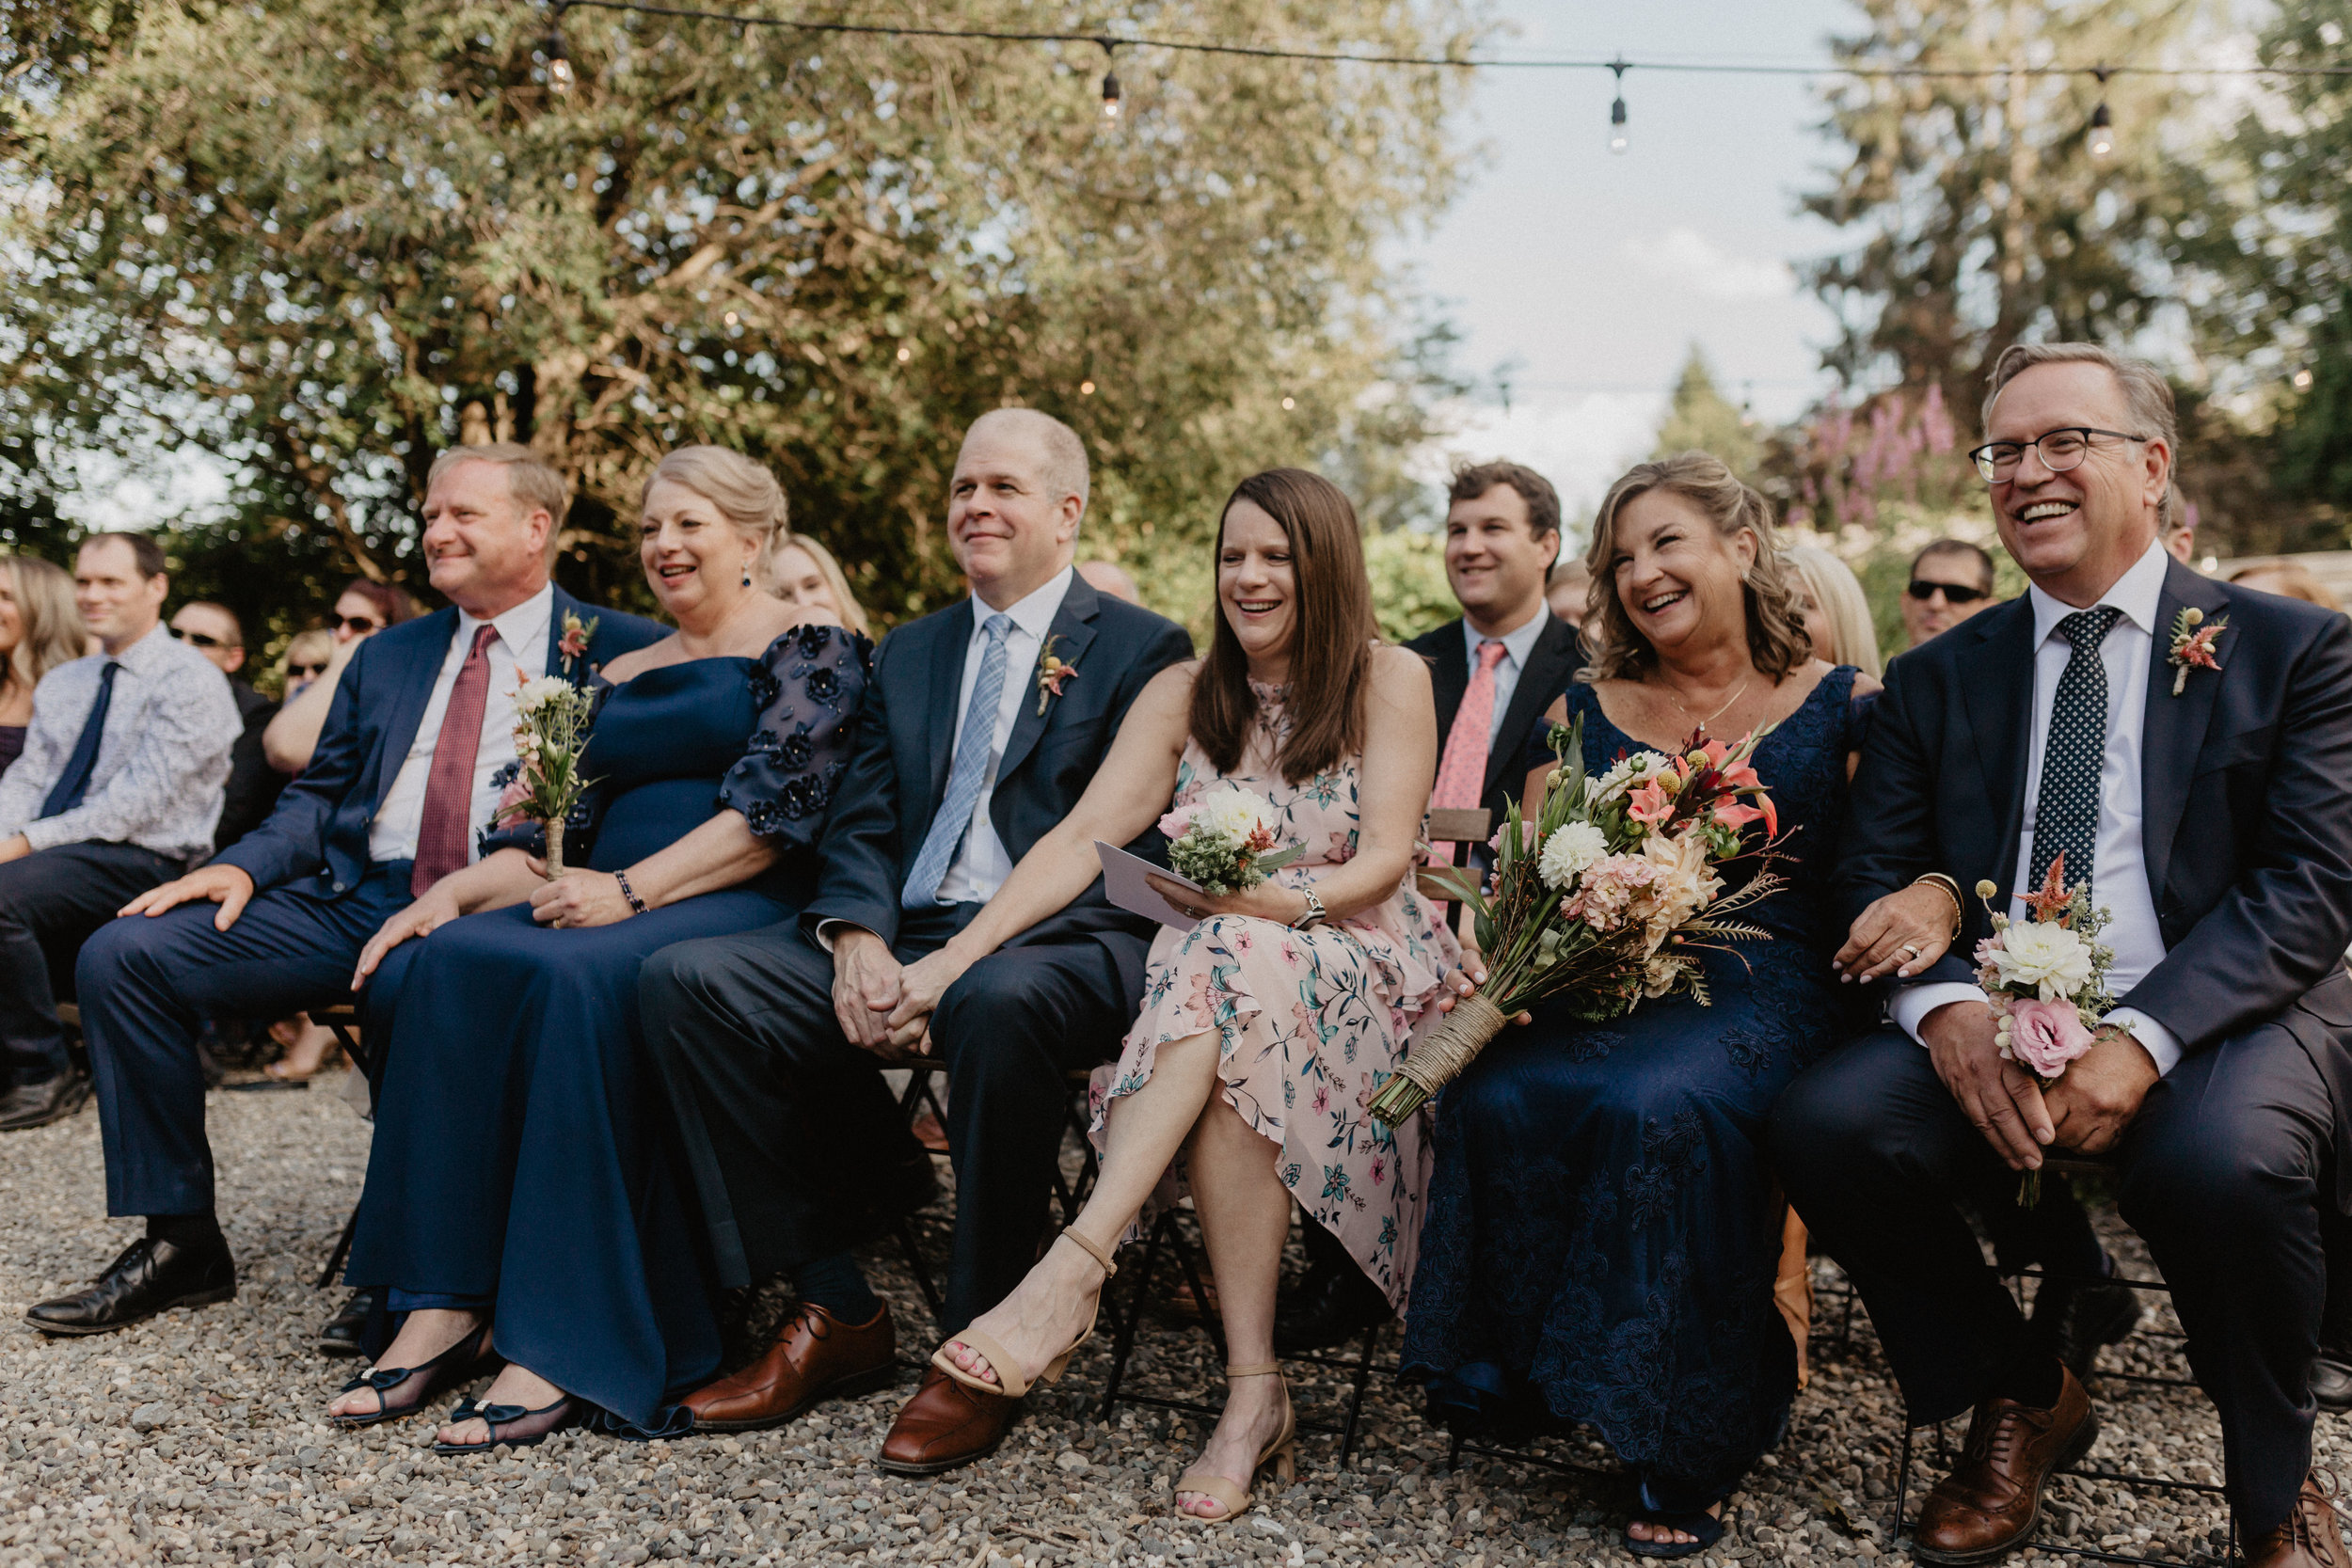 m-and-d-farm-wedding-66.jpg